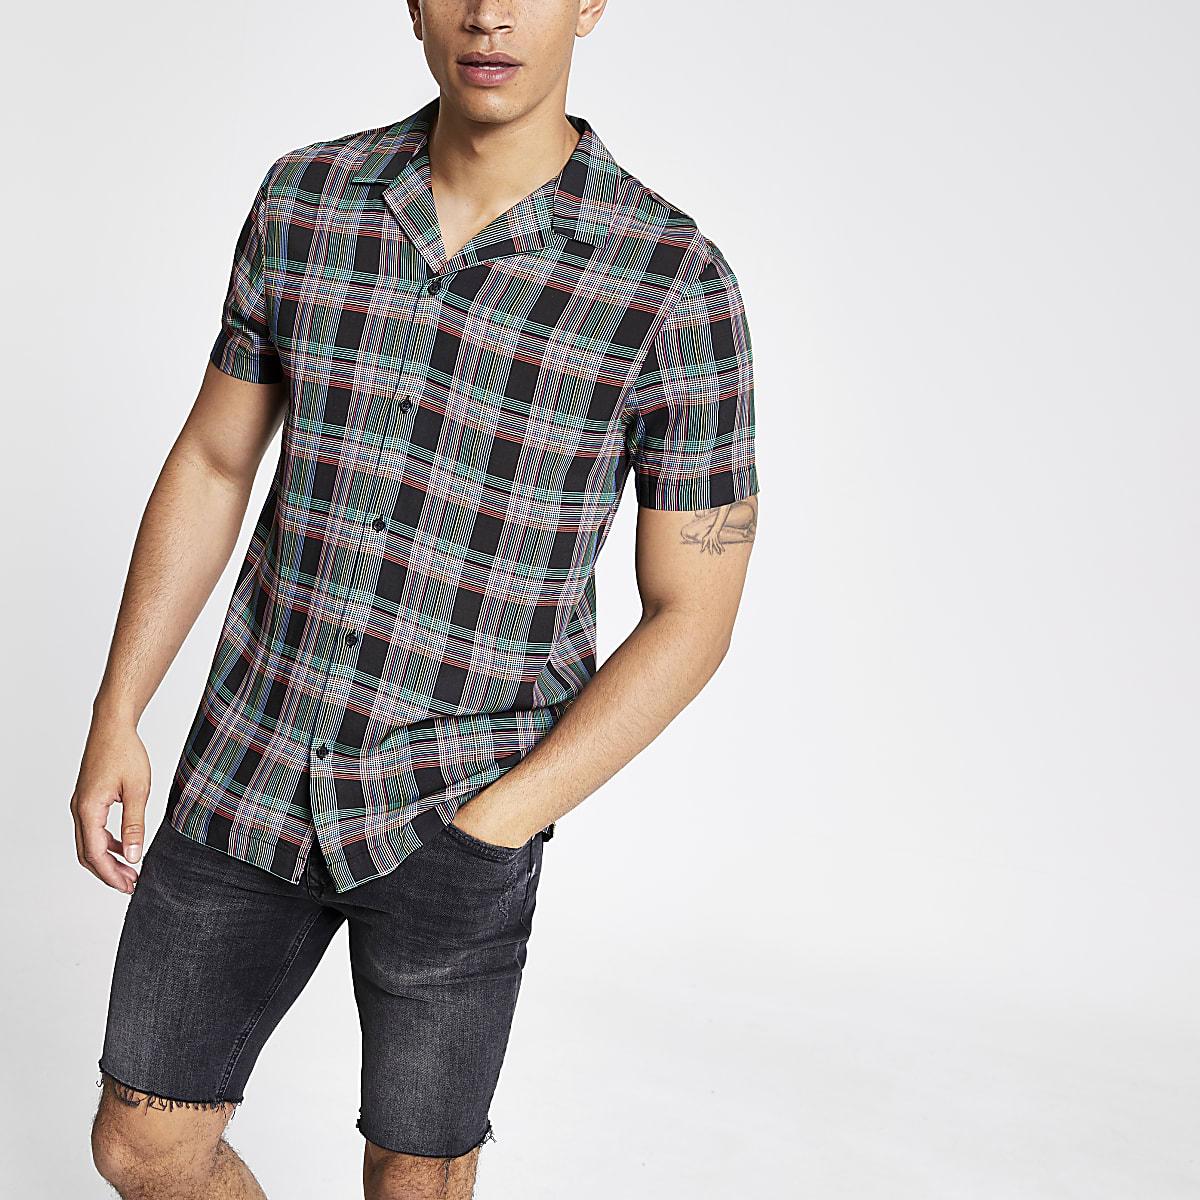 Black neon check shirt